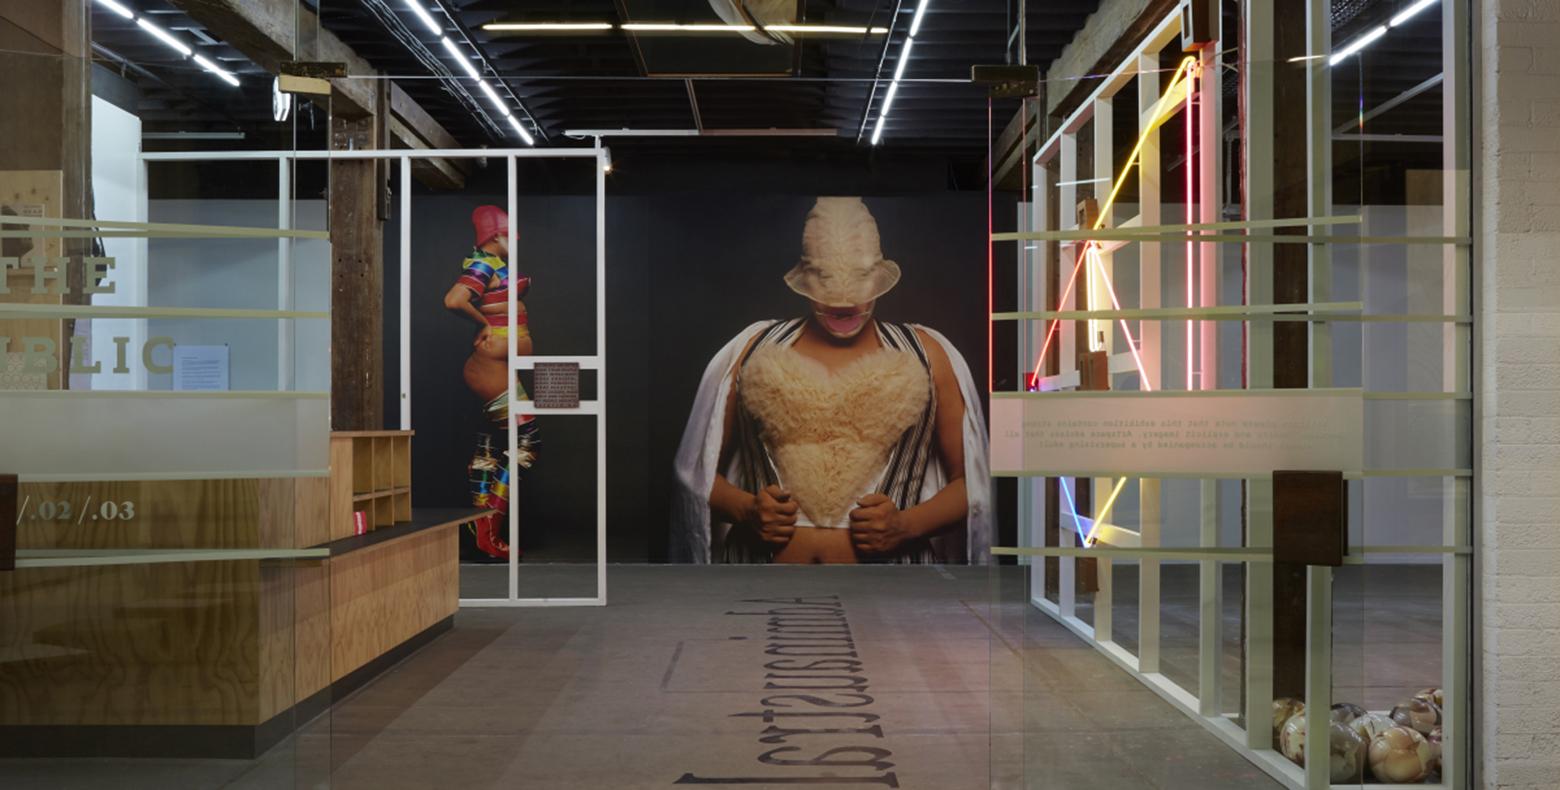 Public body art  THE PUBLIC BODY .02, 2017, installation view, Artspace, Sydney. Photo: Zan  Wimberley